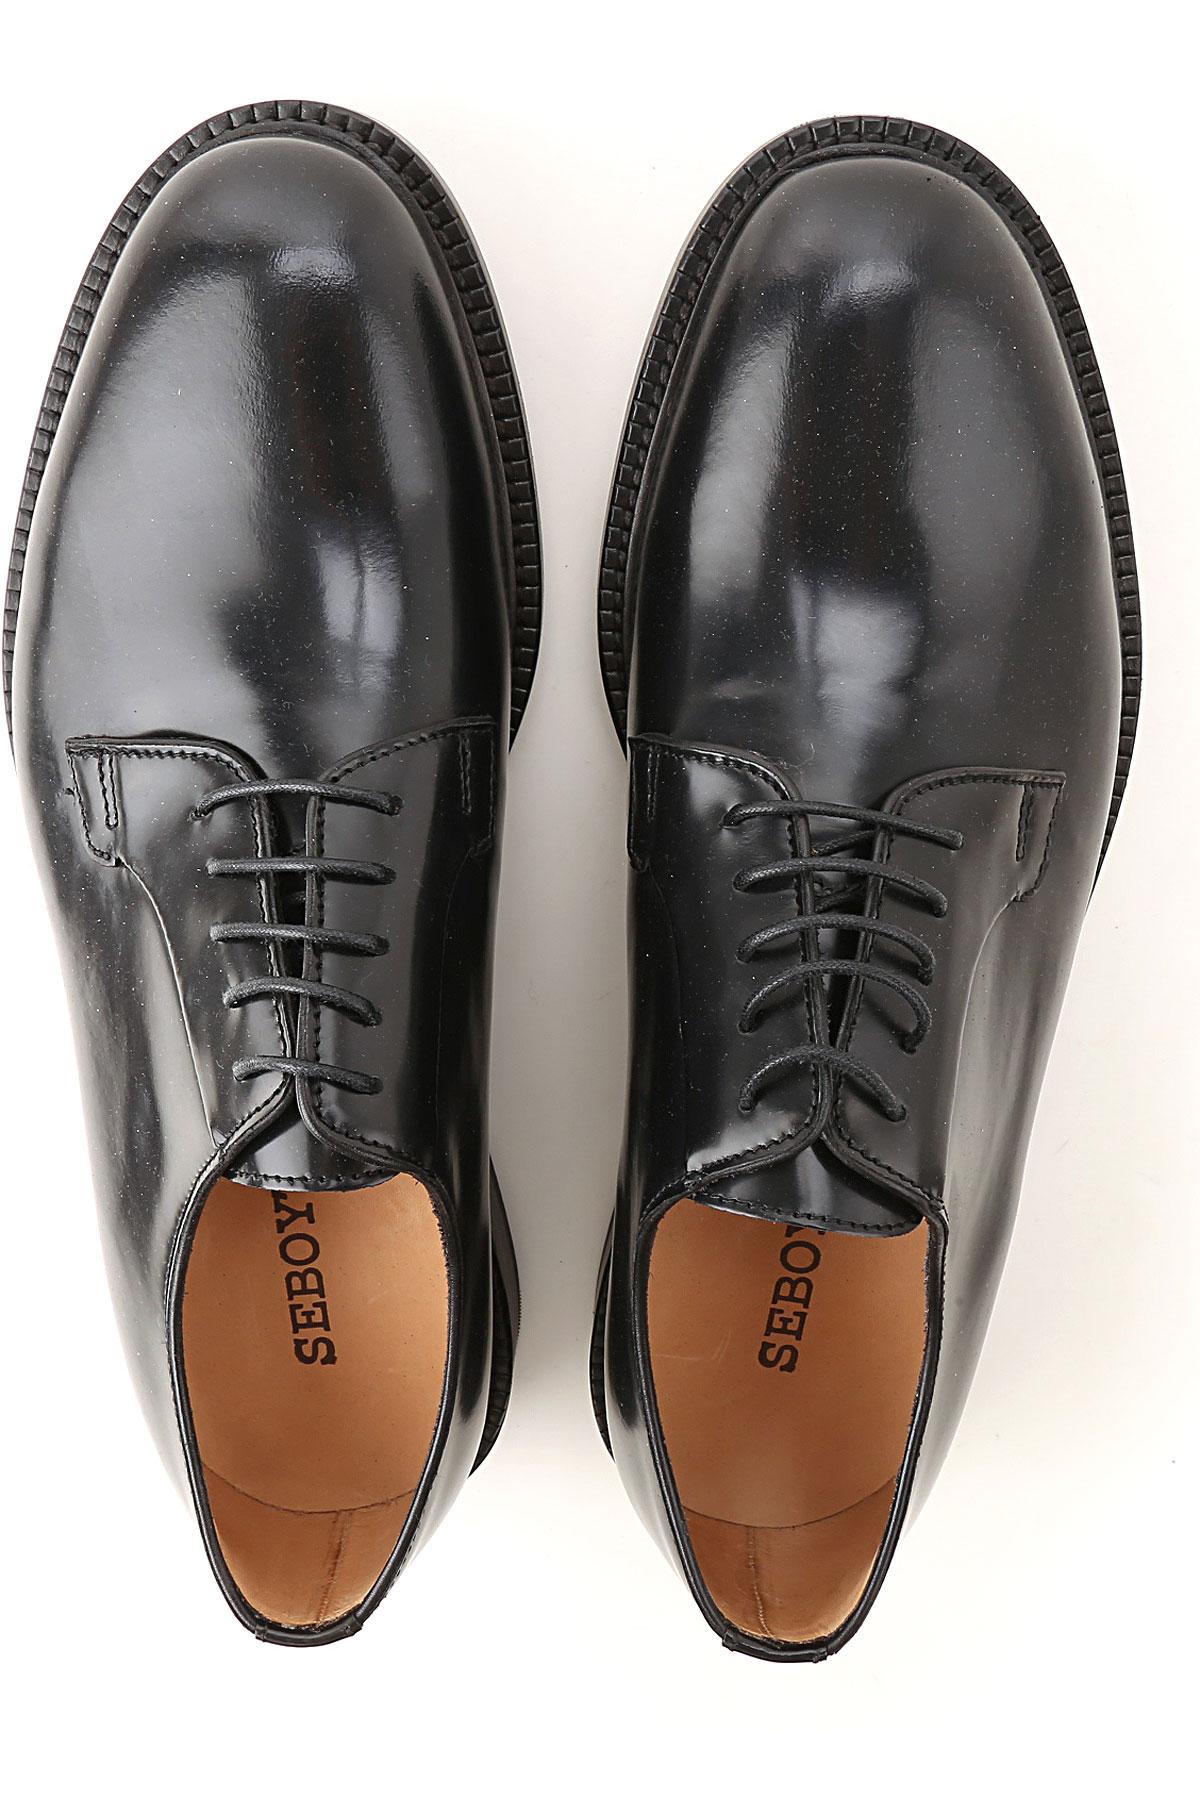 2019 Negro Seboys nbsp; Hombres Zapatos Primavera Para verano TqqUZpXf